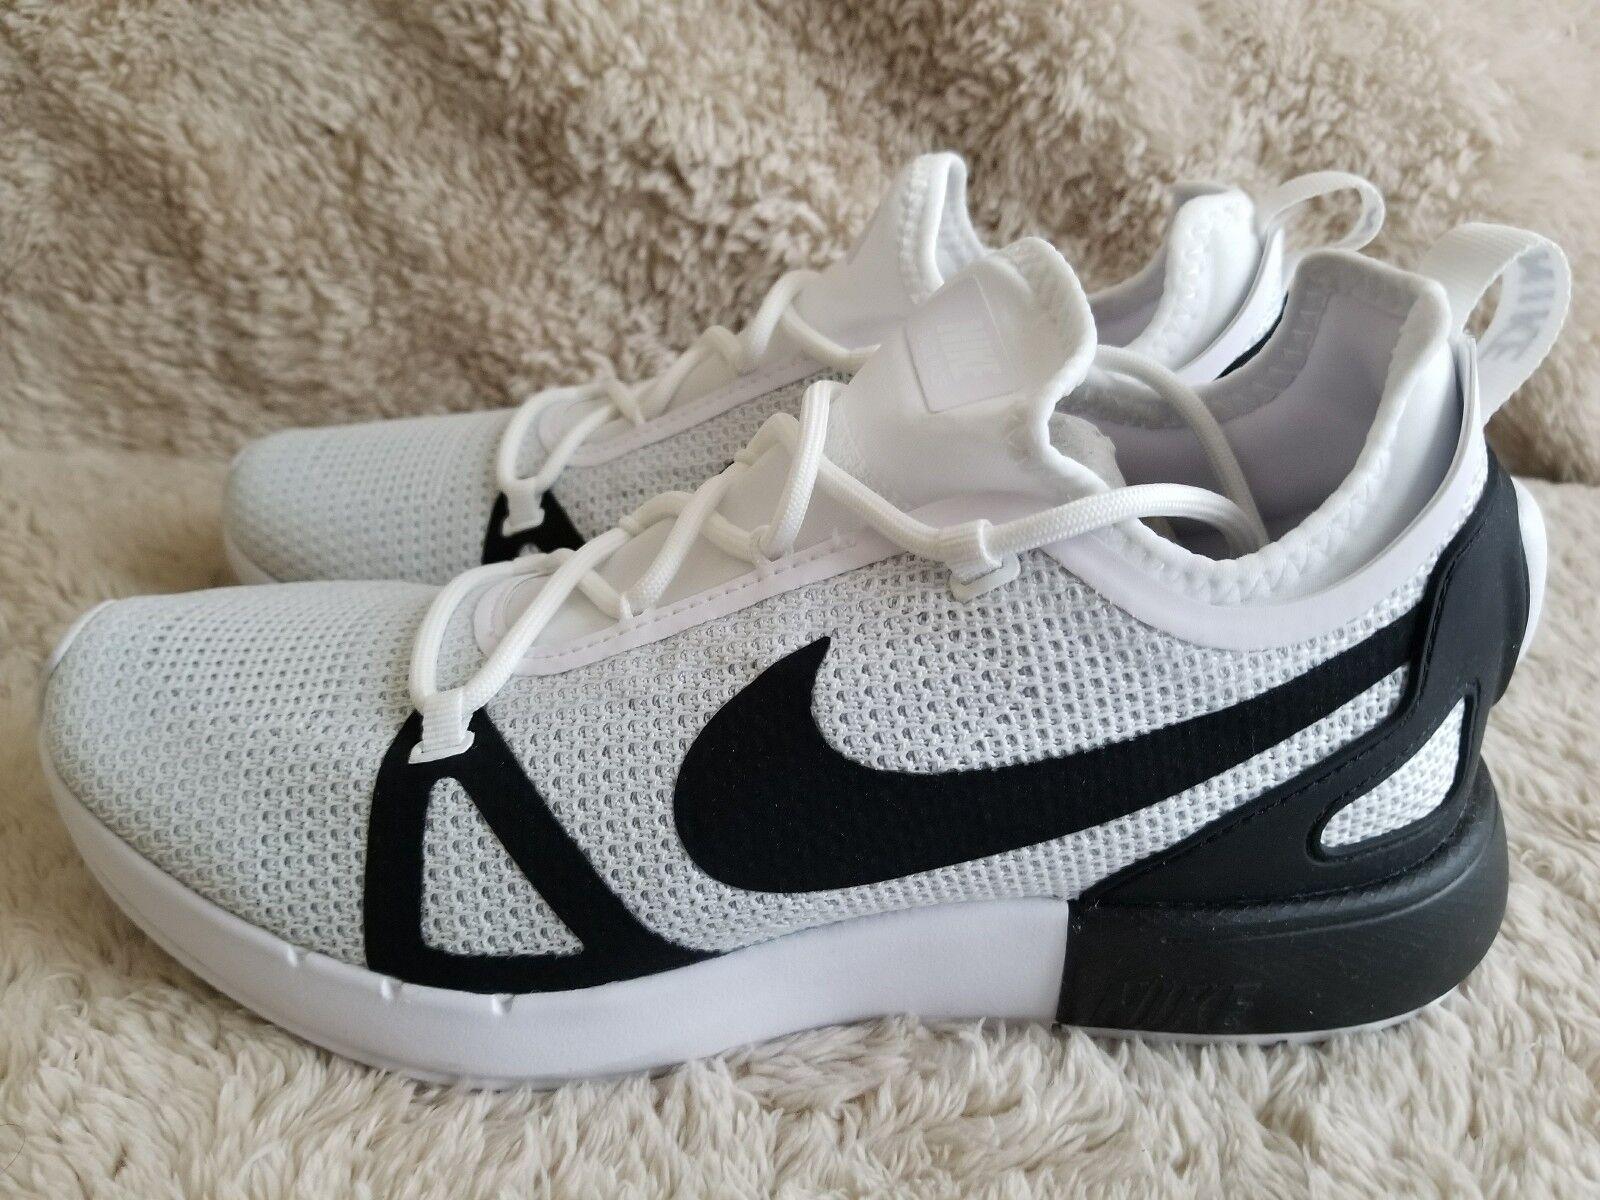 best service a64bd 48d83 ... Nike Duel Racer 918228-102 White Black Platinum Men s Sportswear  Sportswear Sportswear Running shoes 47d3ea ...